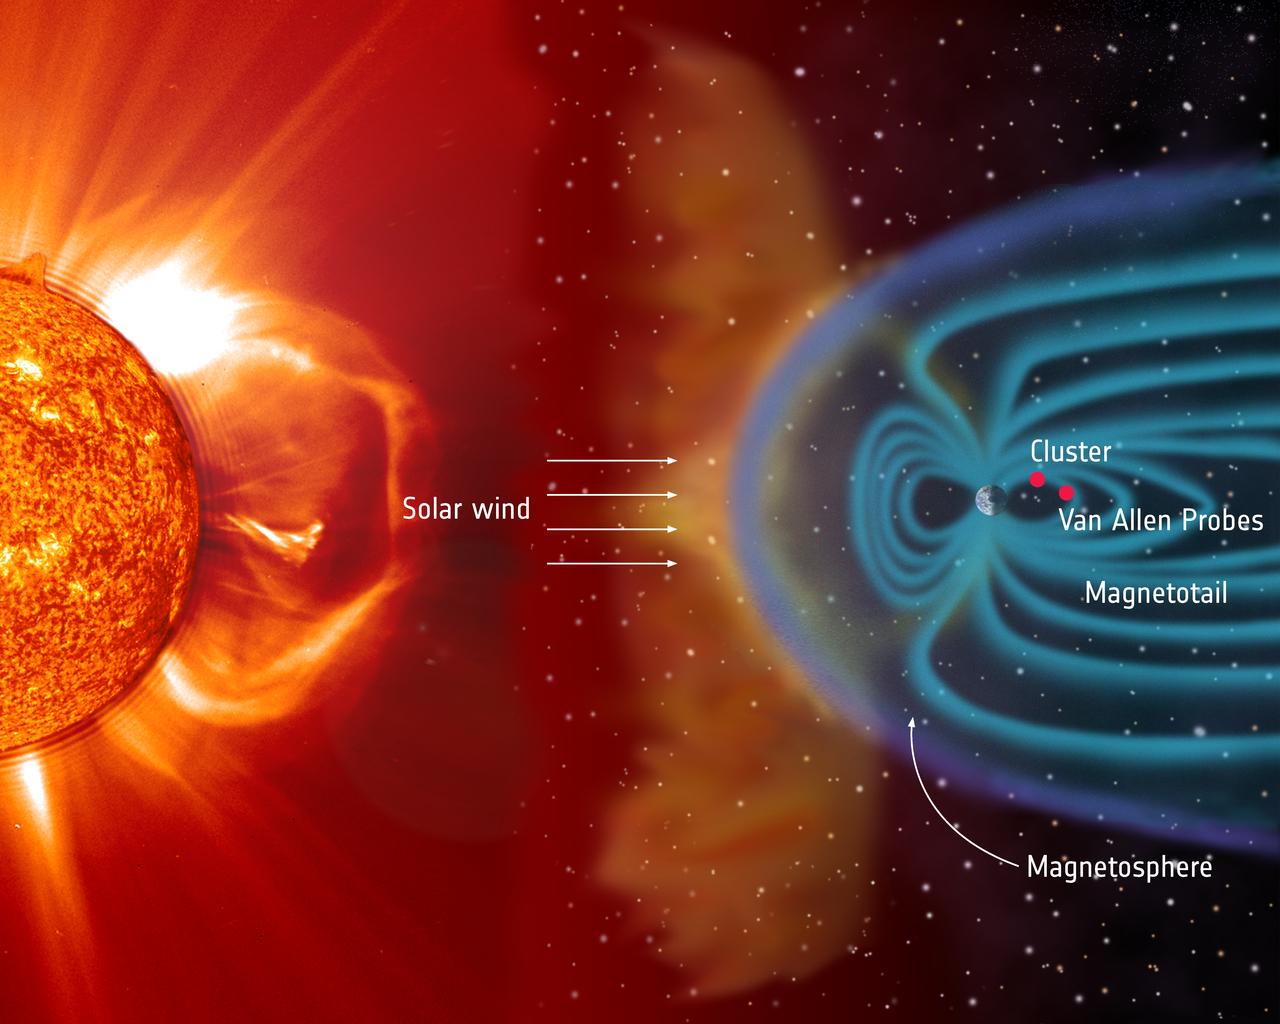 1567214117875-Cluster_and_Van_Allen_Probes_in_Earth_magnetosphere_1280.jpg